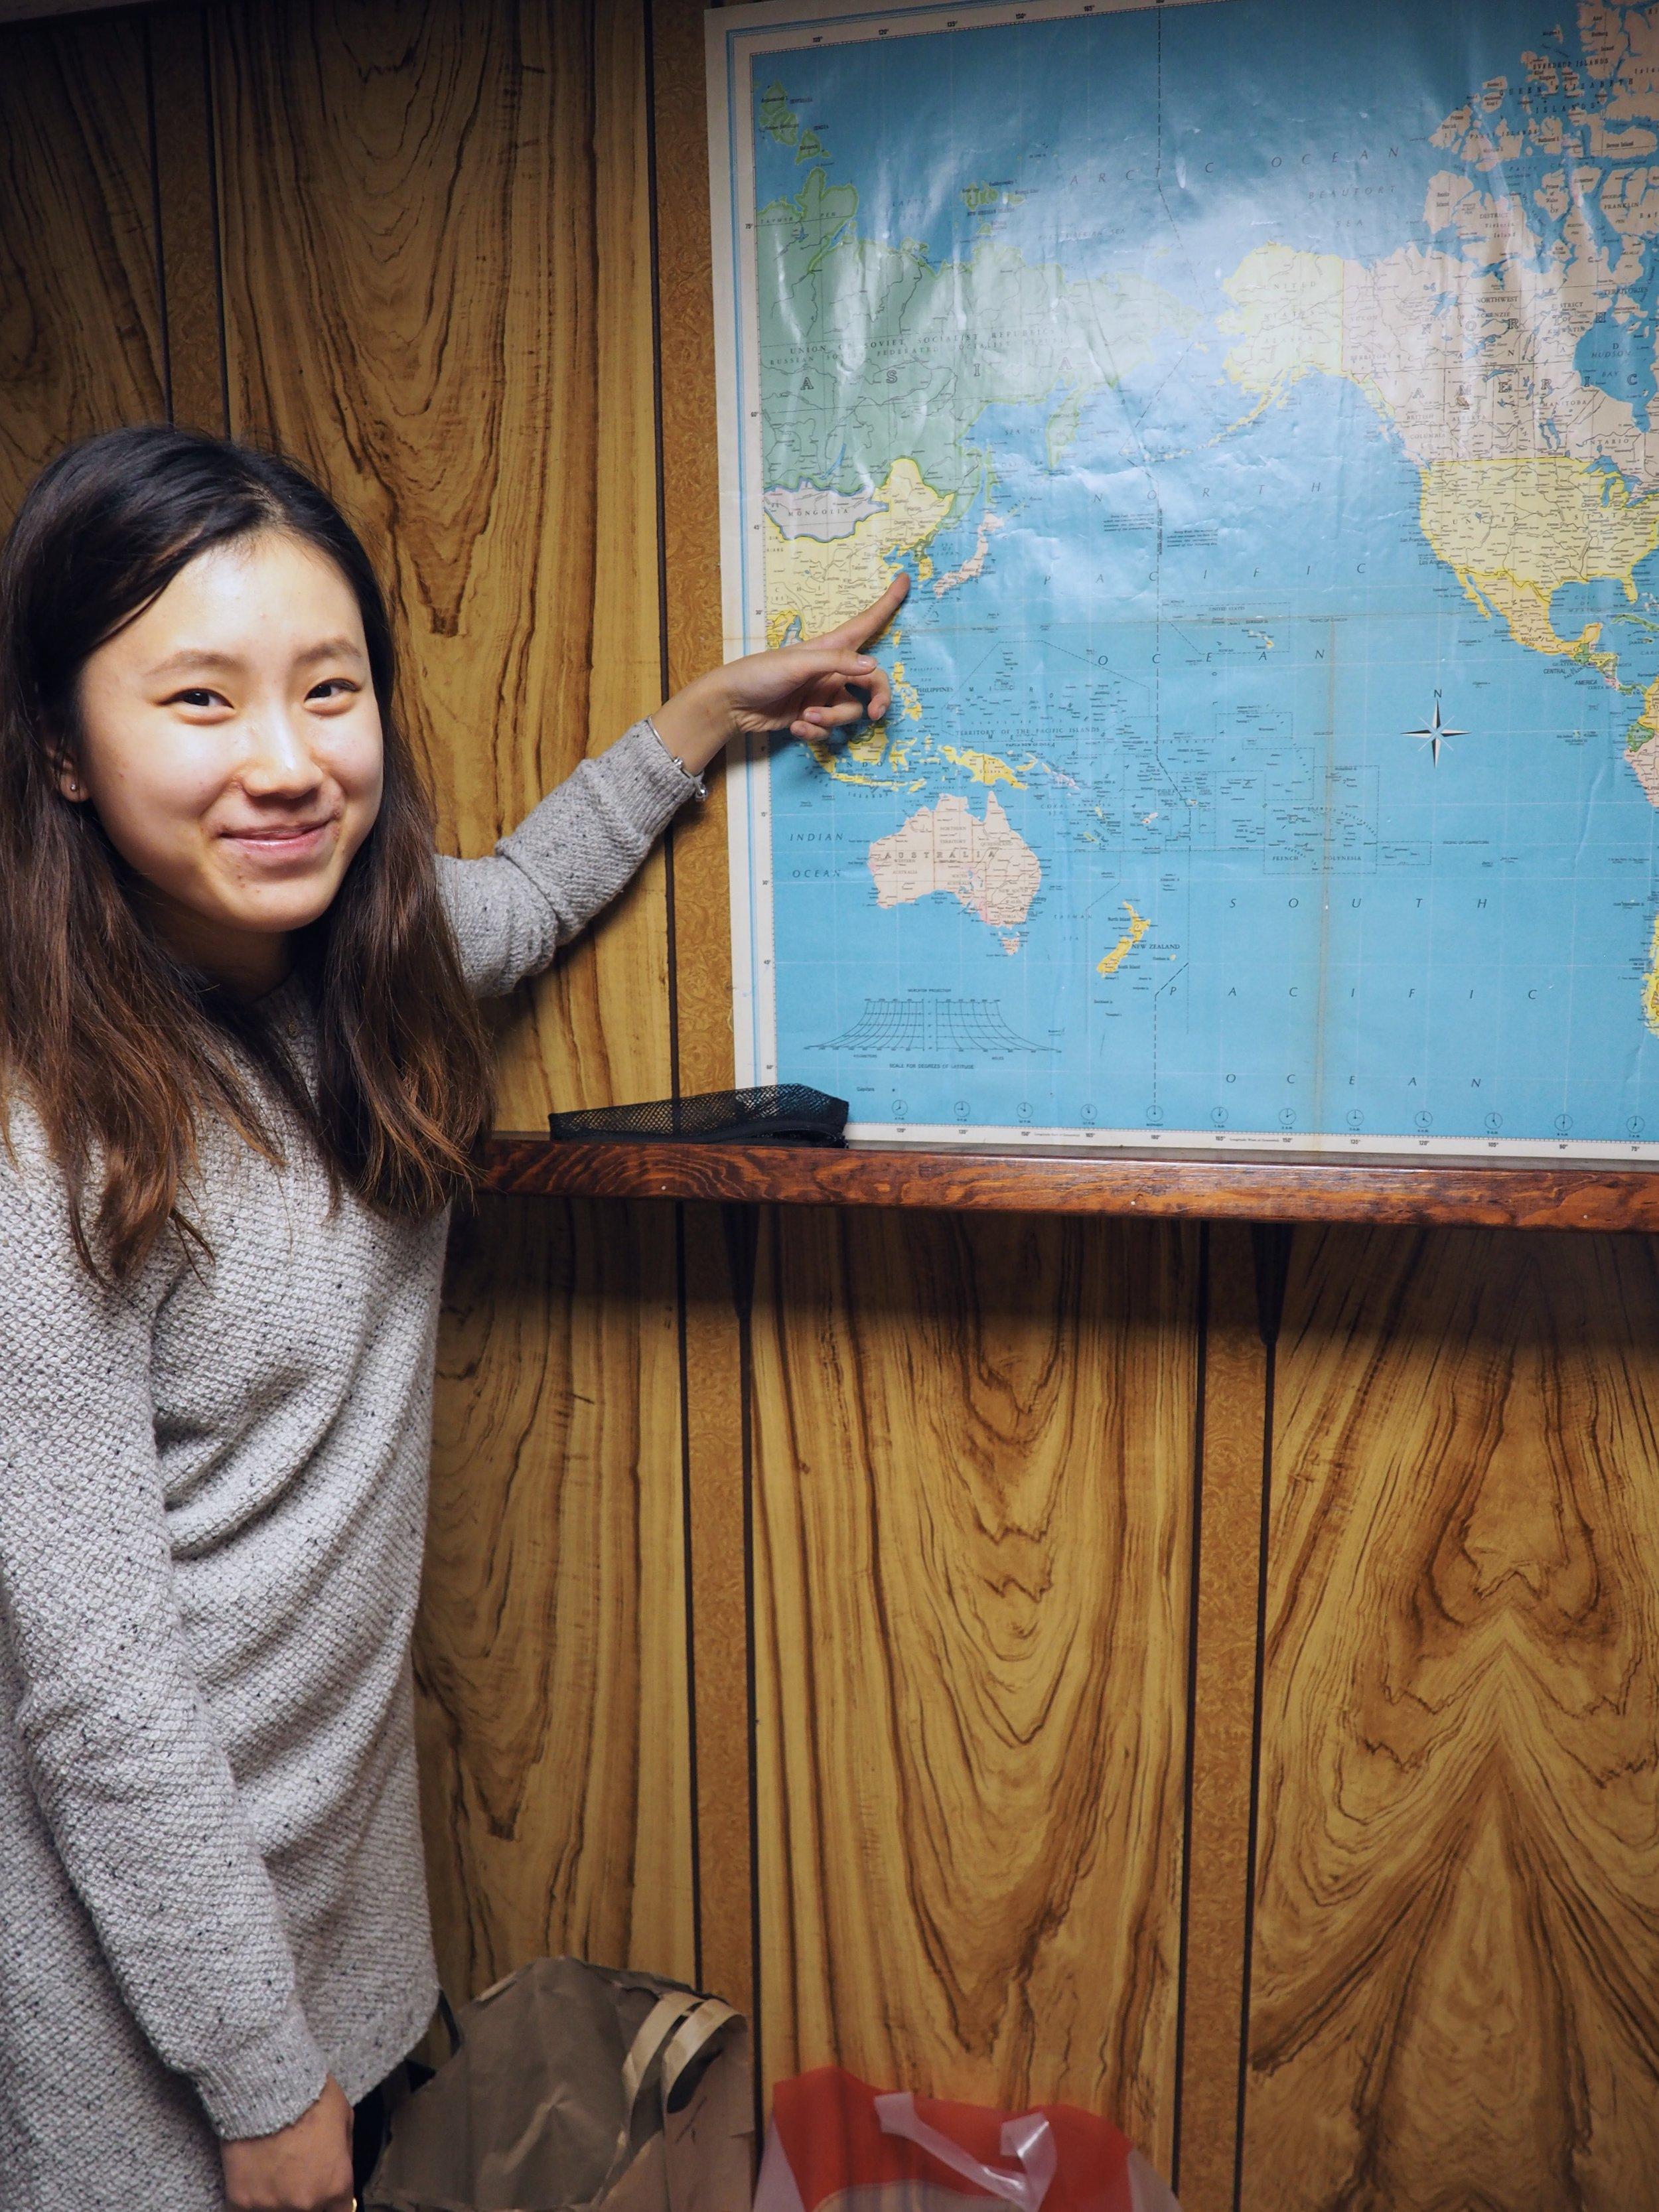 Hye: Korea